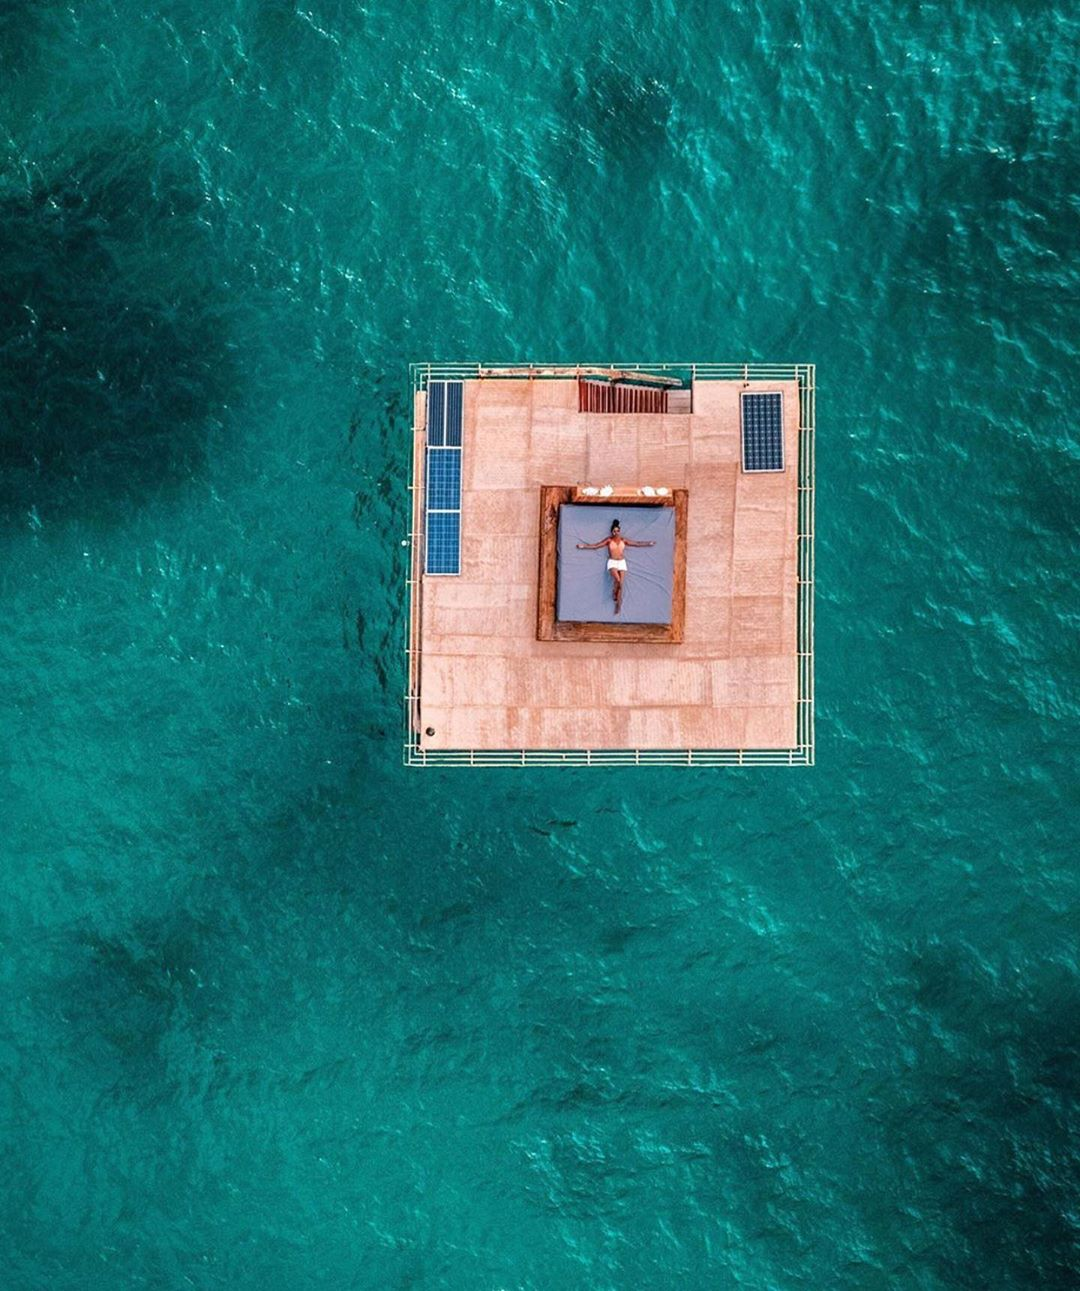 Honeymoon Goals: המלונות הכי משוגעים מסביב לעולם